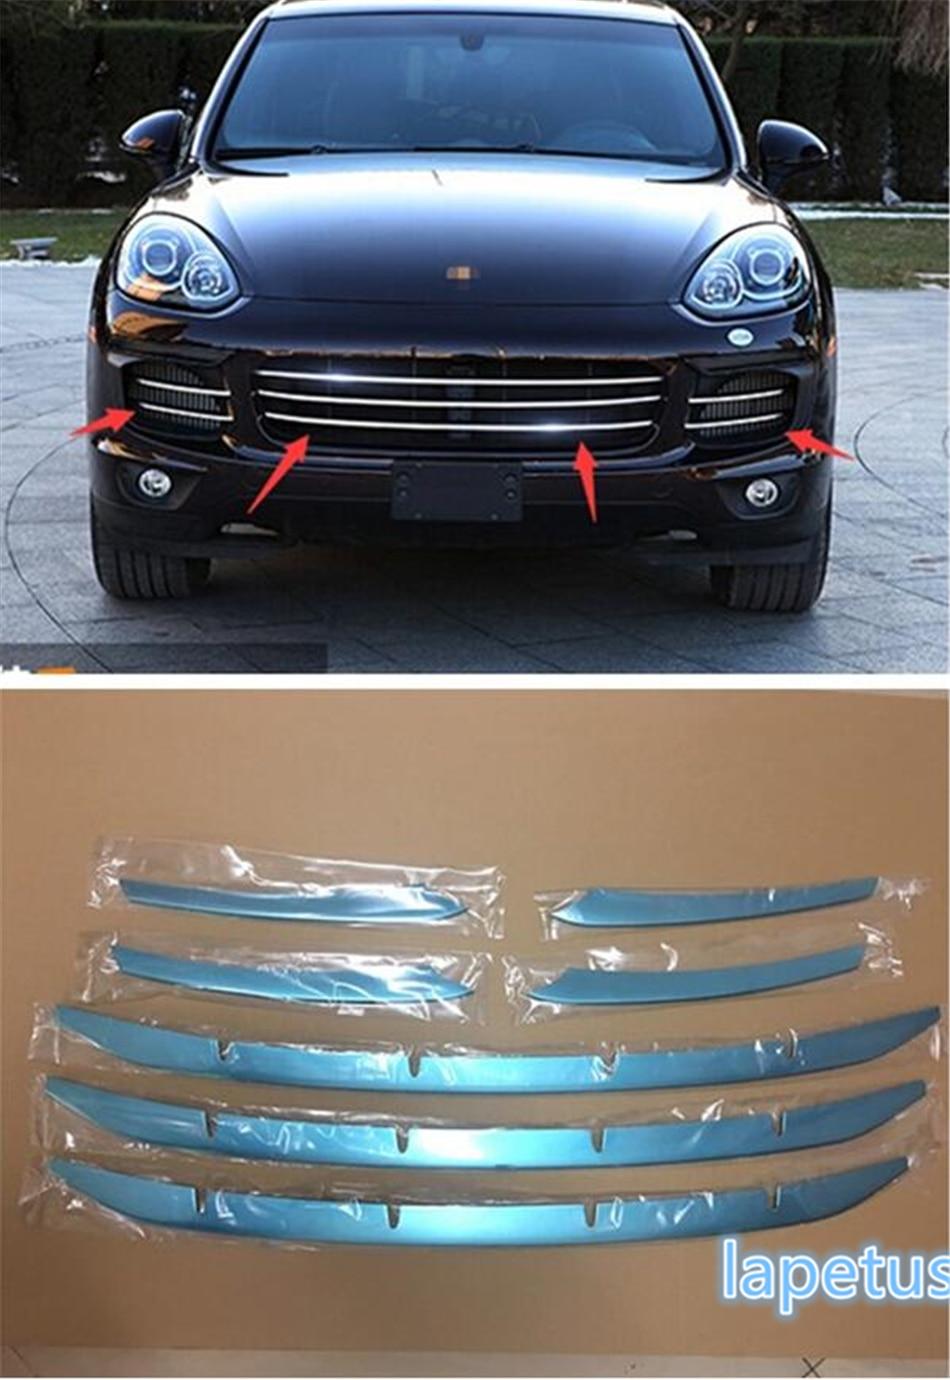 FORD FIESTA 2008-5 portes lockwood sill protecteurs kick plaques en acier inoxydable